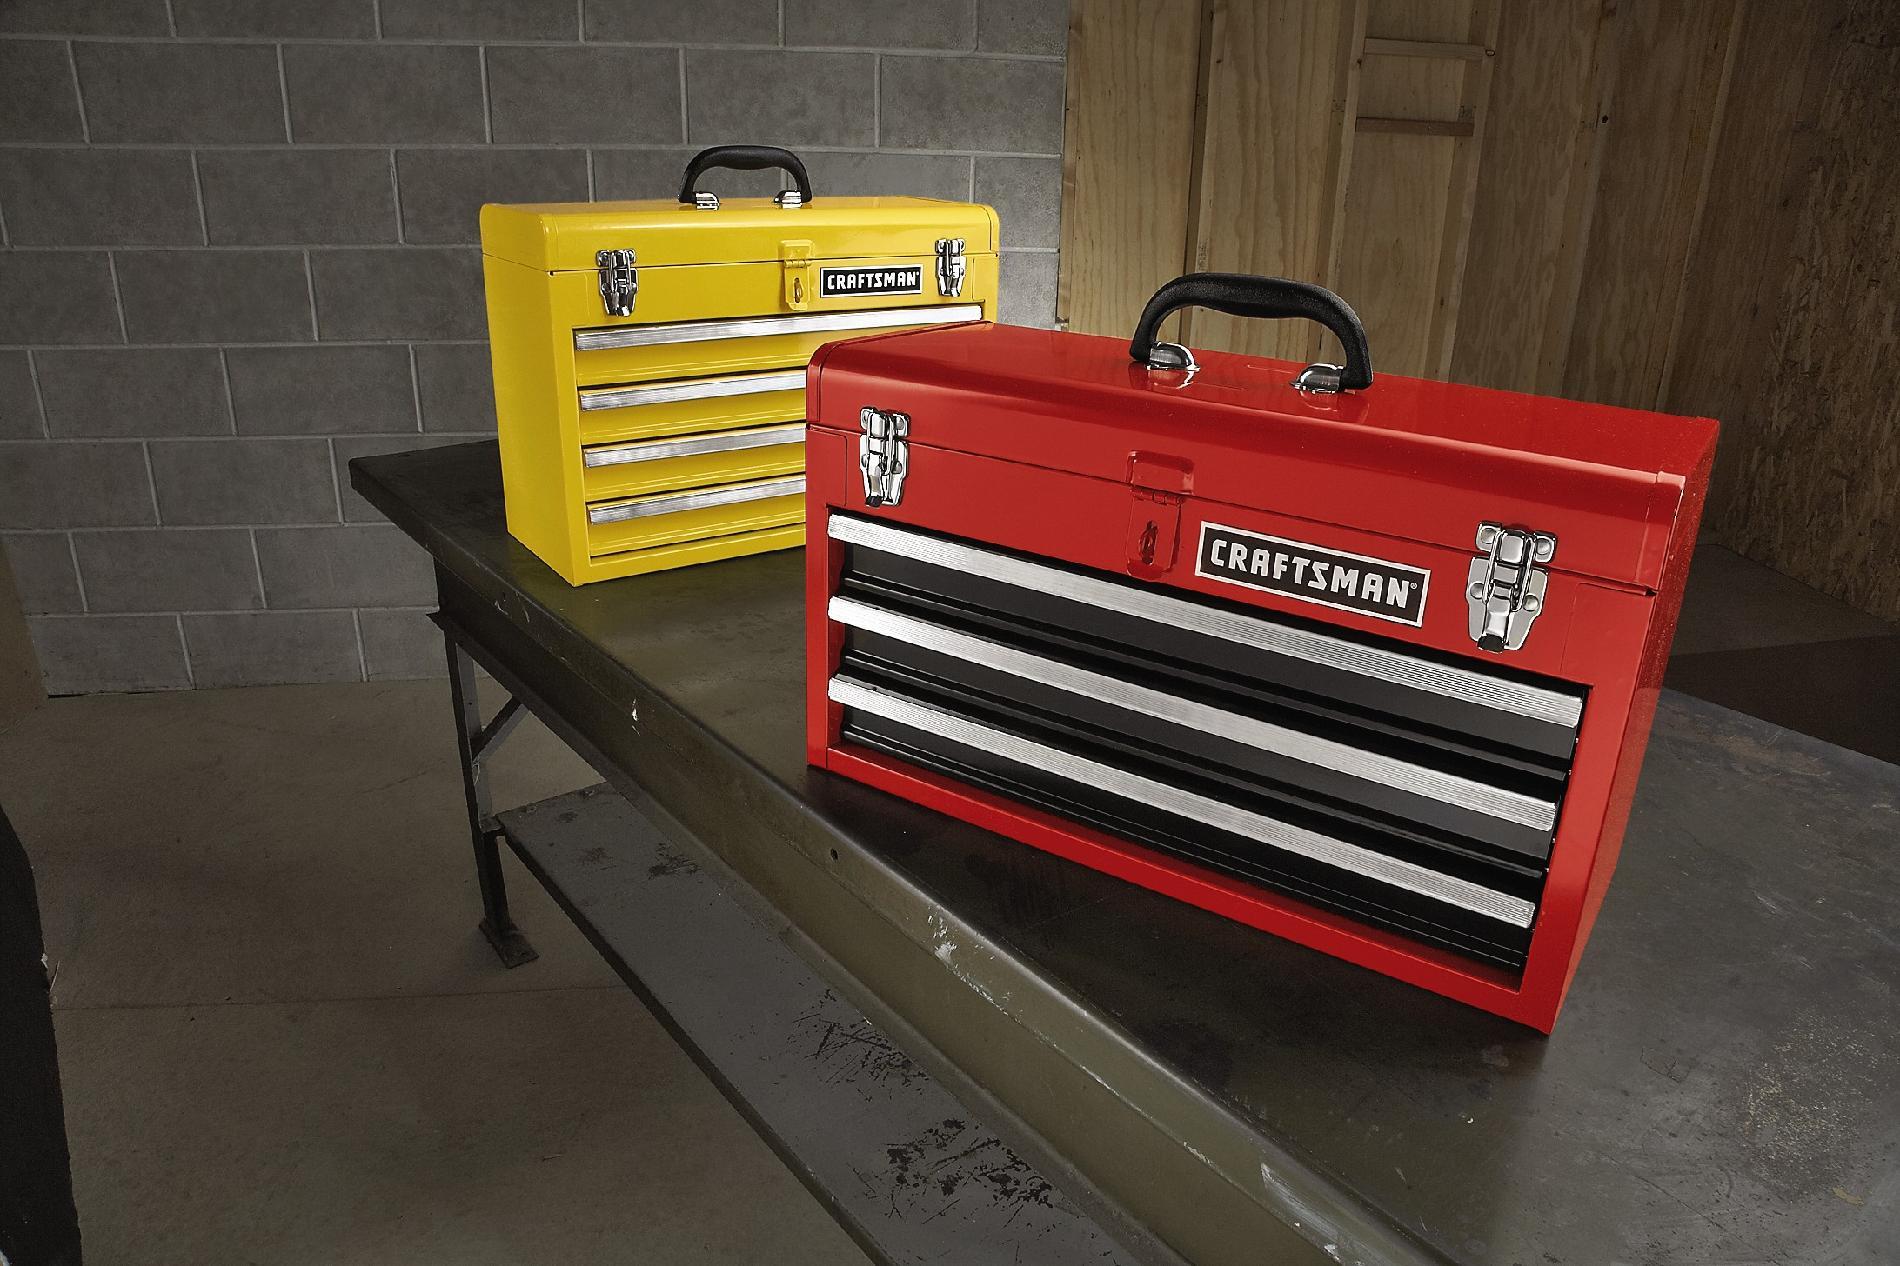 Craftsman 3-Drawer Metal Portable Chest-Red/Black